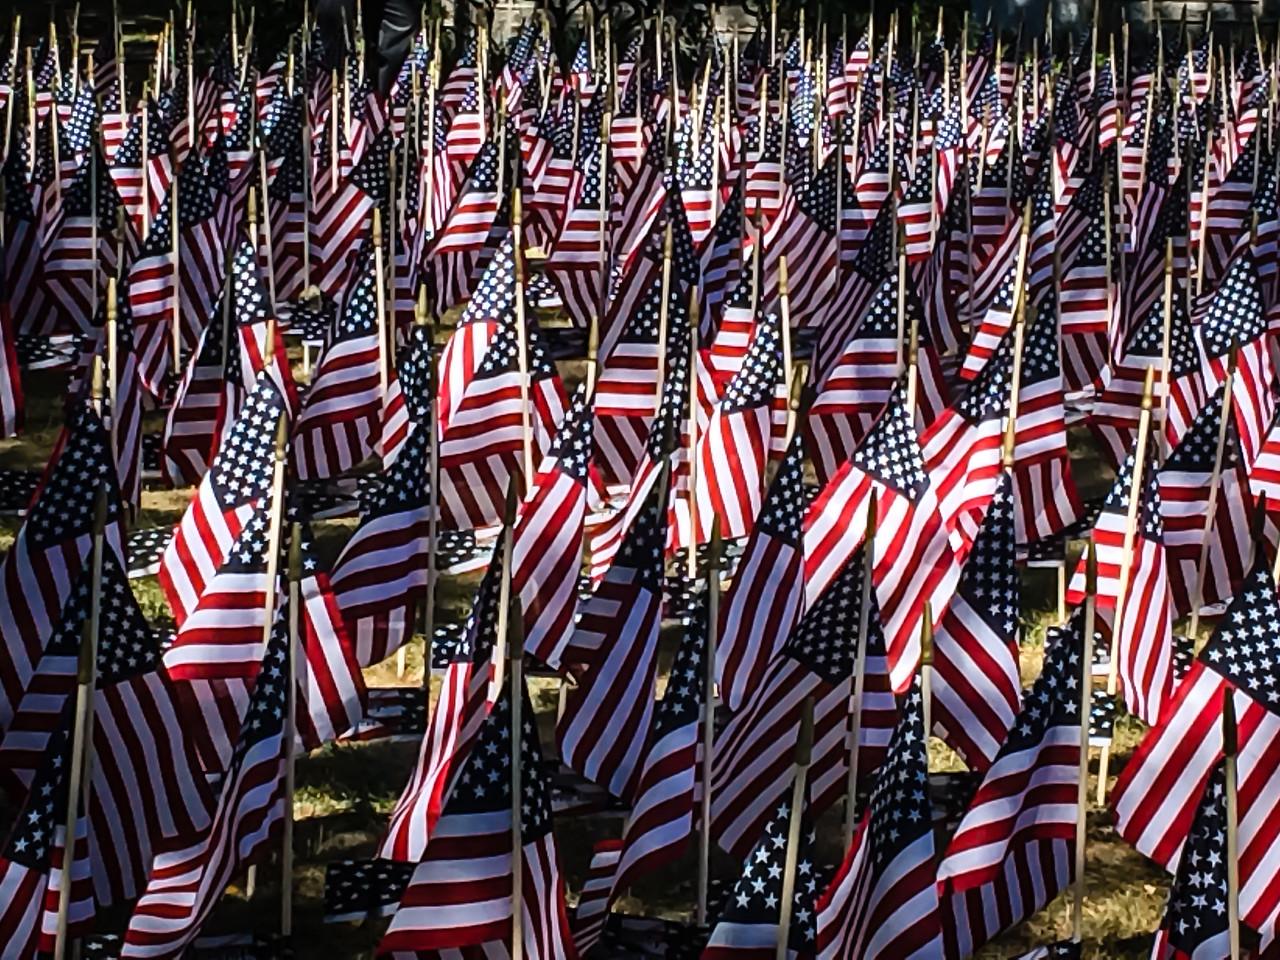 9/11 15th Anniversary